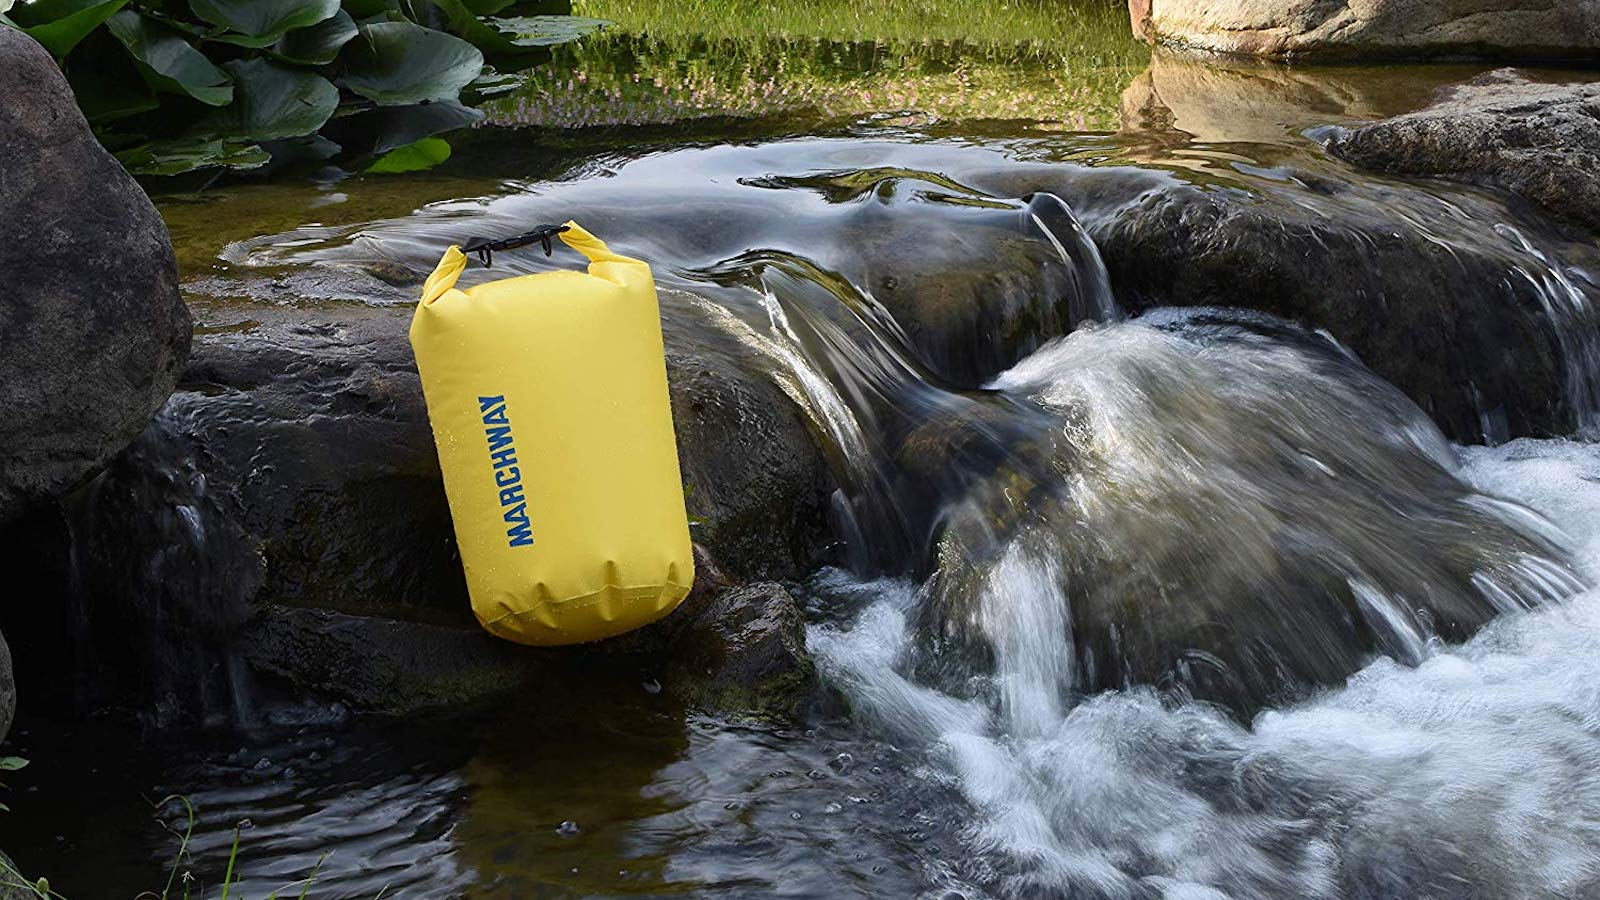 MARCHWAY Floating Waterproof Roll Top Dry Bag keeps all your belongings safe